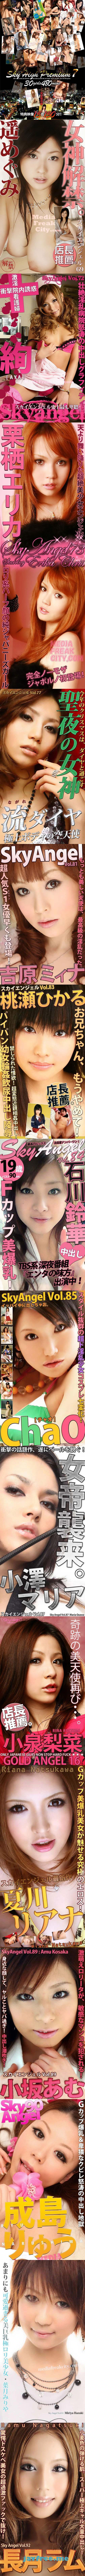 [SKY 179] SkyHigh Premium 7 長月ラム 鈴木さとみ 葉月みりあ 流ダイヤ 梨菜 広瀬藍子 小澤マリア 夏川リアナ 乙井なずな あいの詩 SkyHigh Premium SKY Aiko Hirose